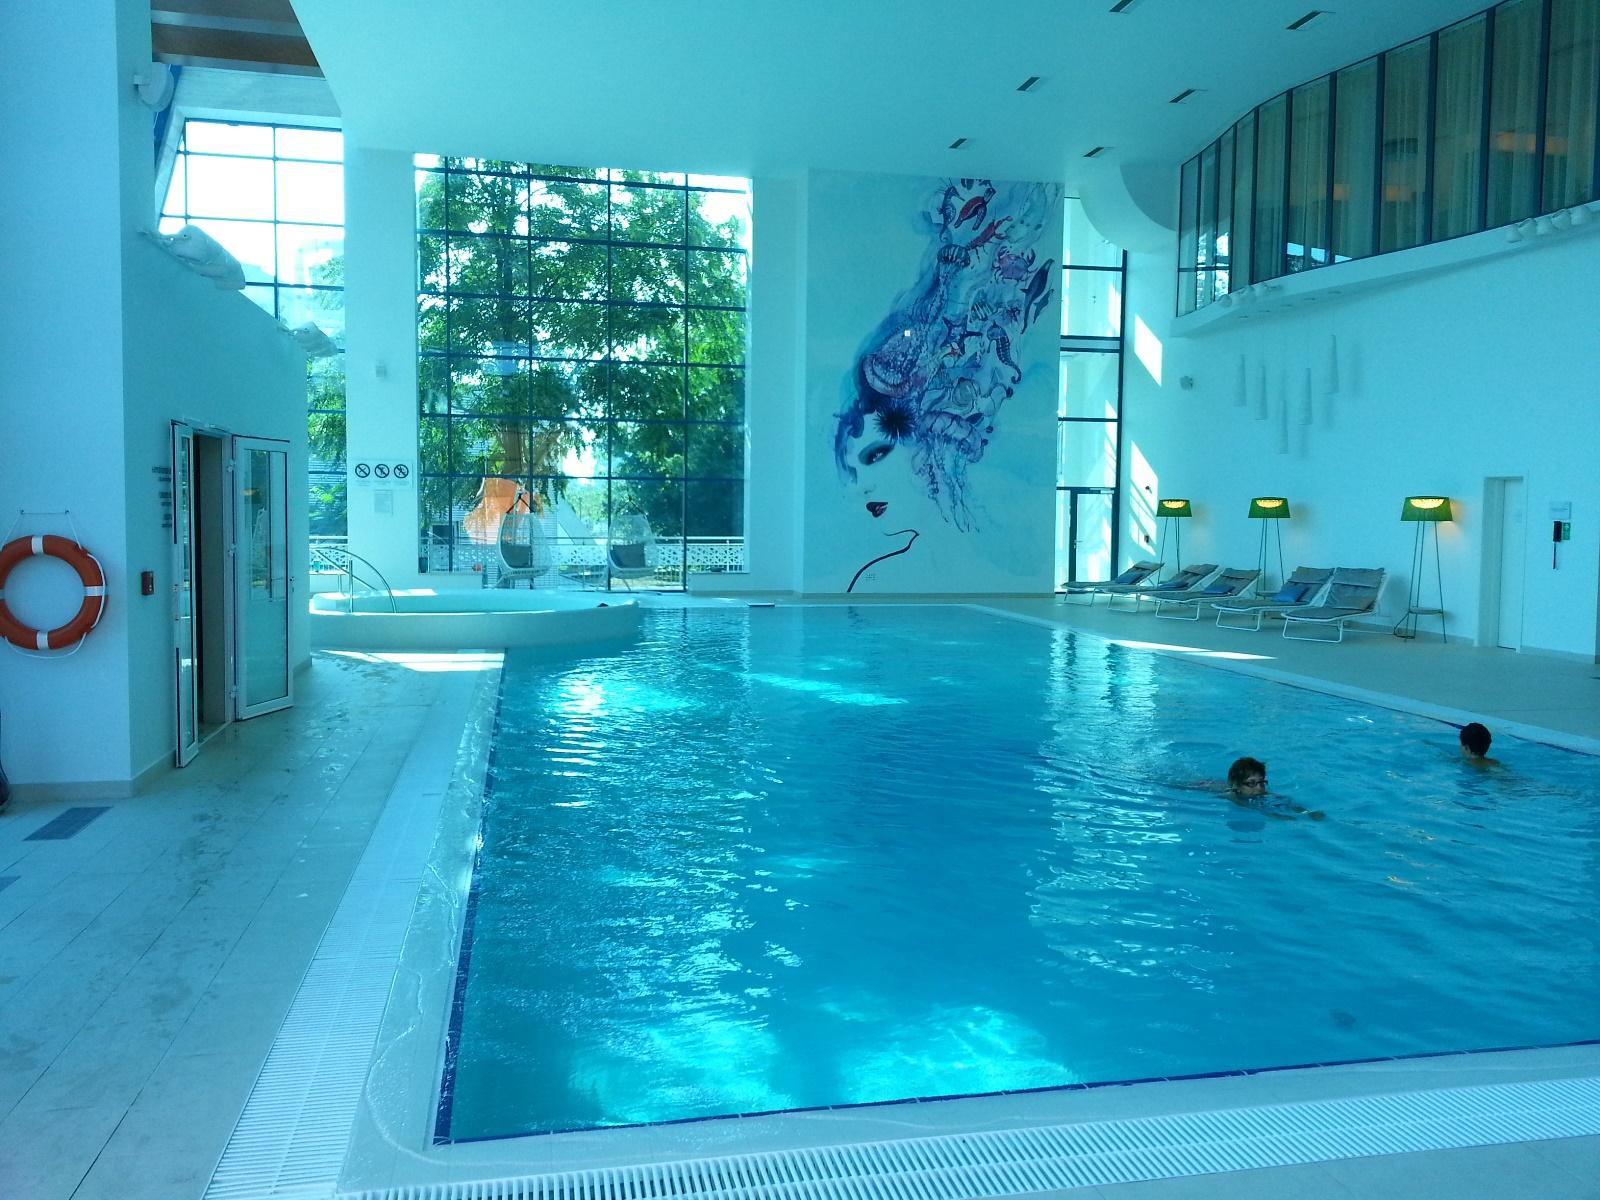 DoubleTree by Hilton Oradea Rumunia strefa wellness basen jacuzzi